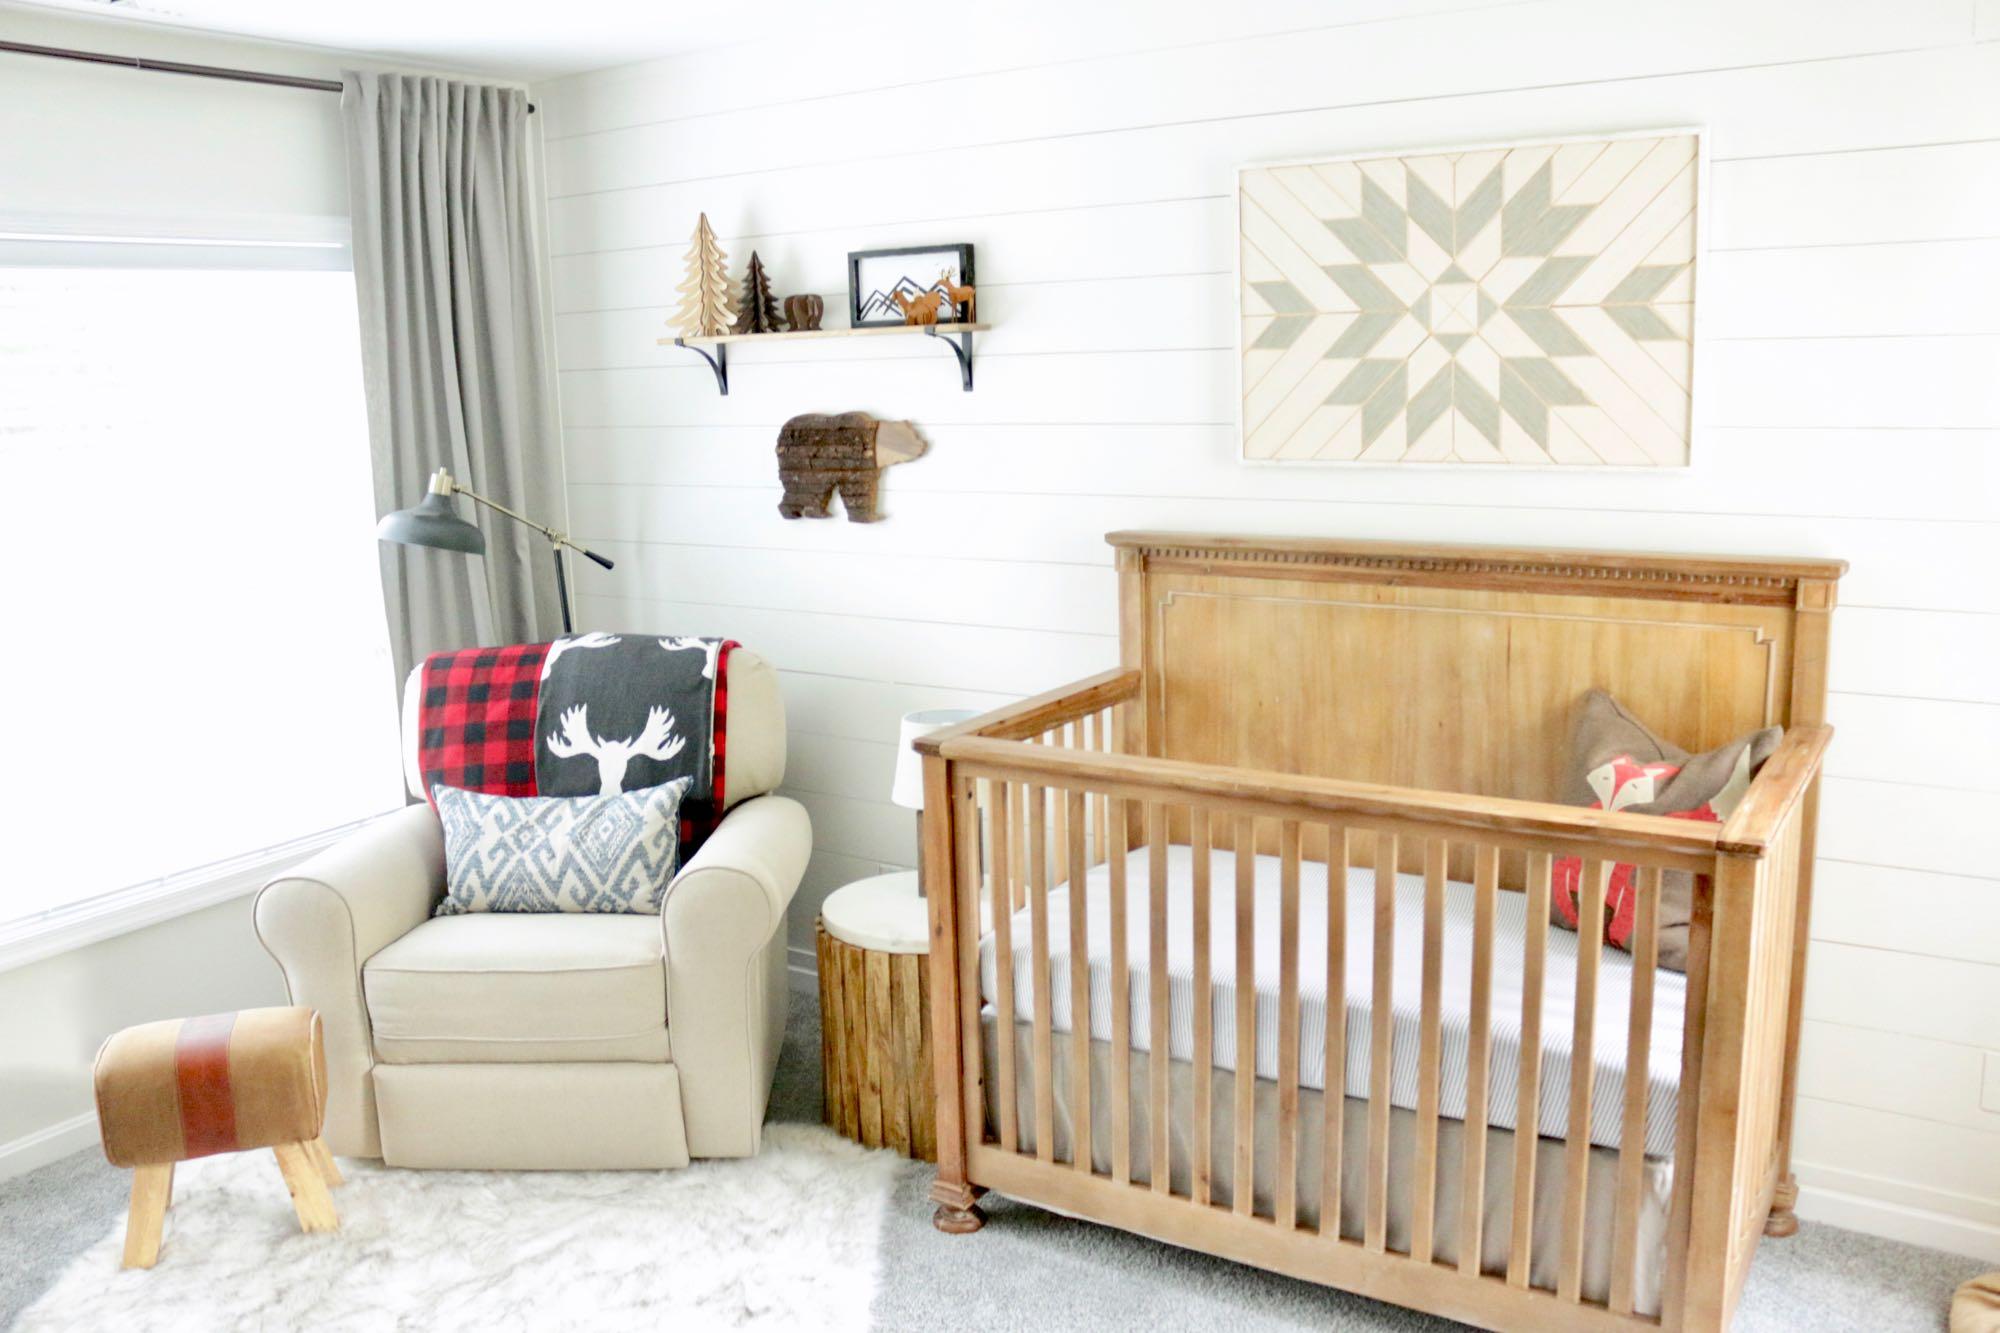 Adventure Nursery Chair & Crib